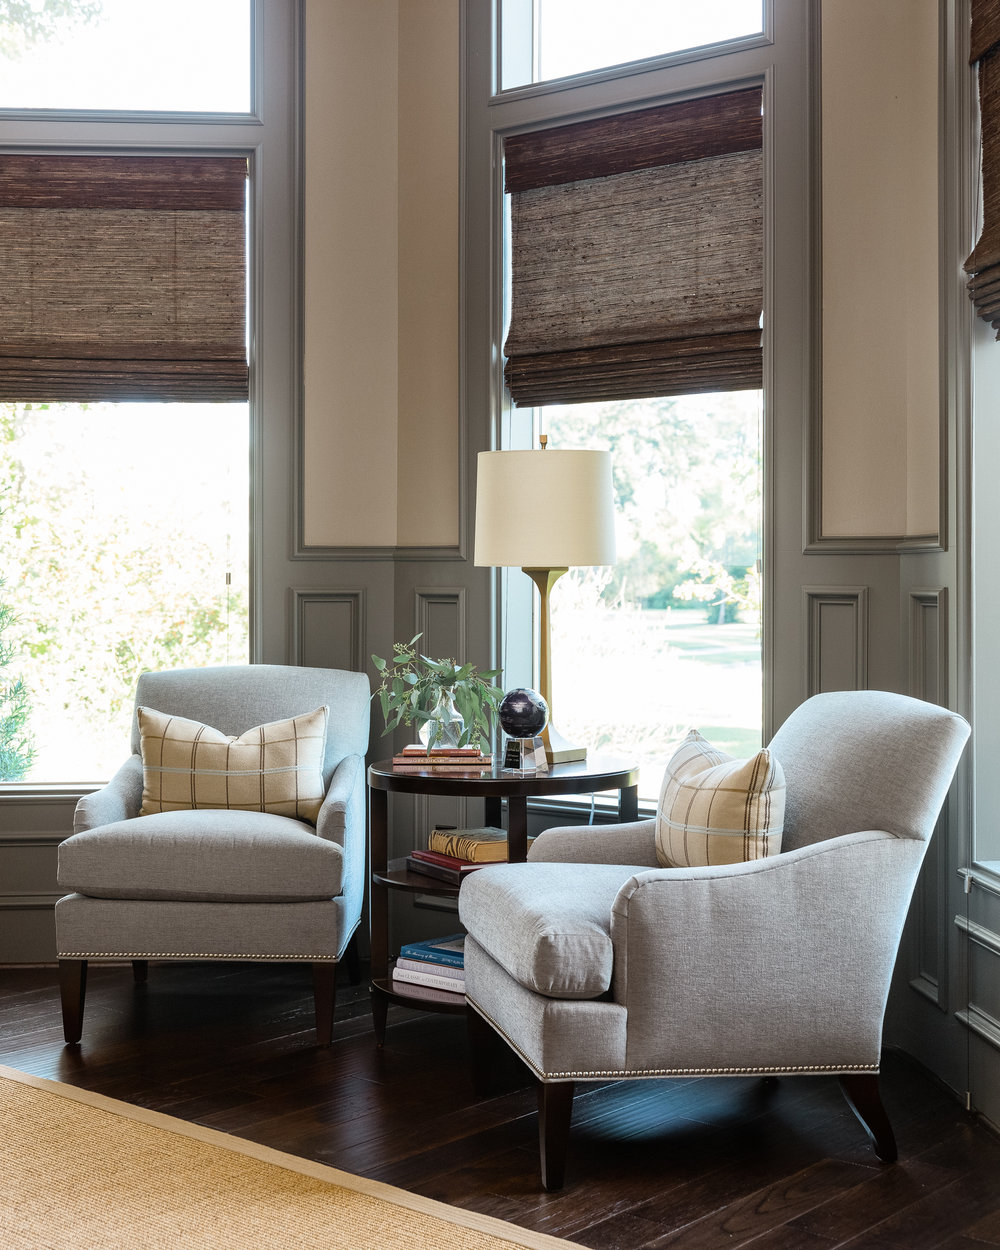 Home Office Seating | Carla Aston - Designer,  Colleen Scott - Photographer #study #homeoffice #paneling